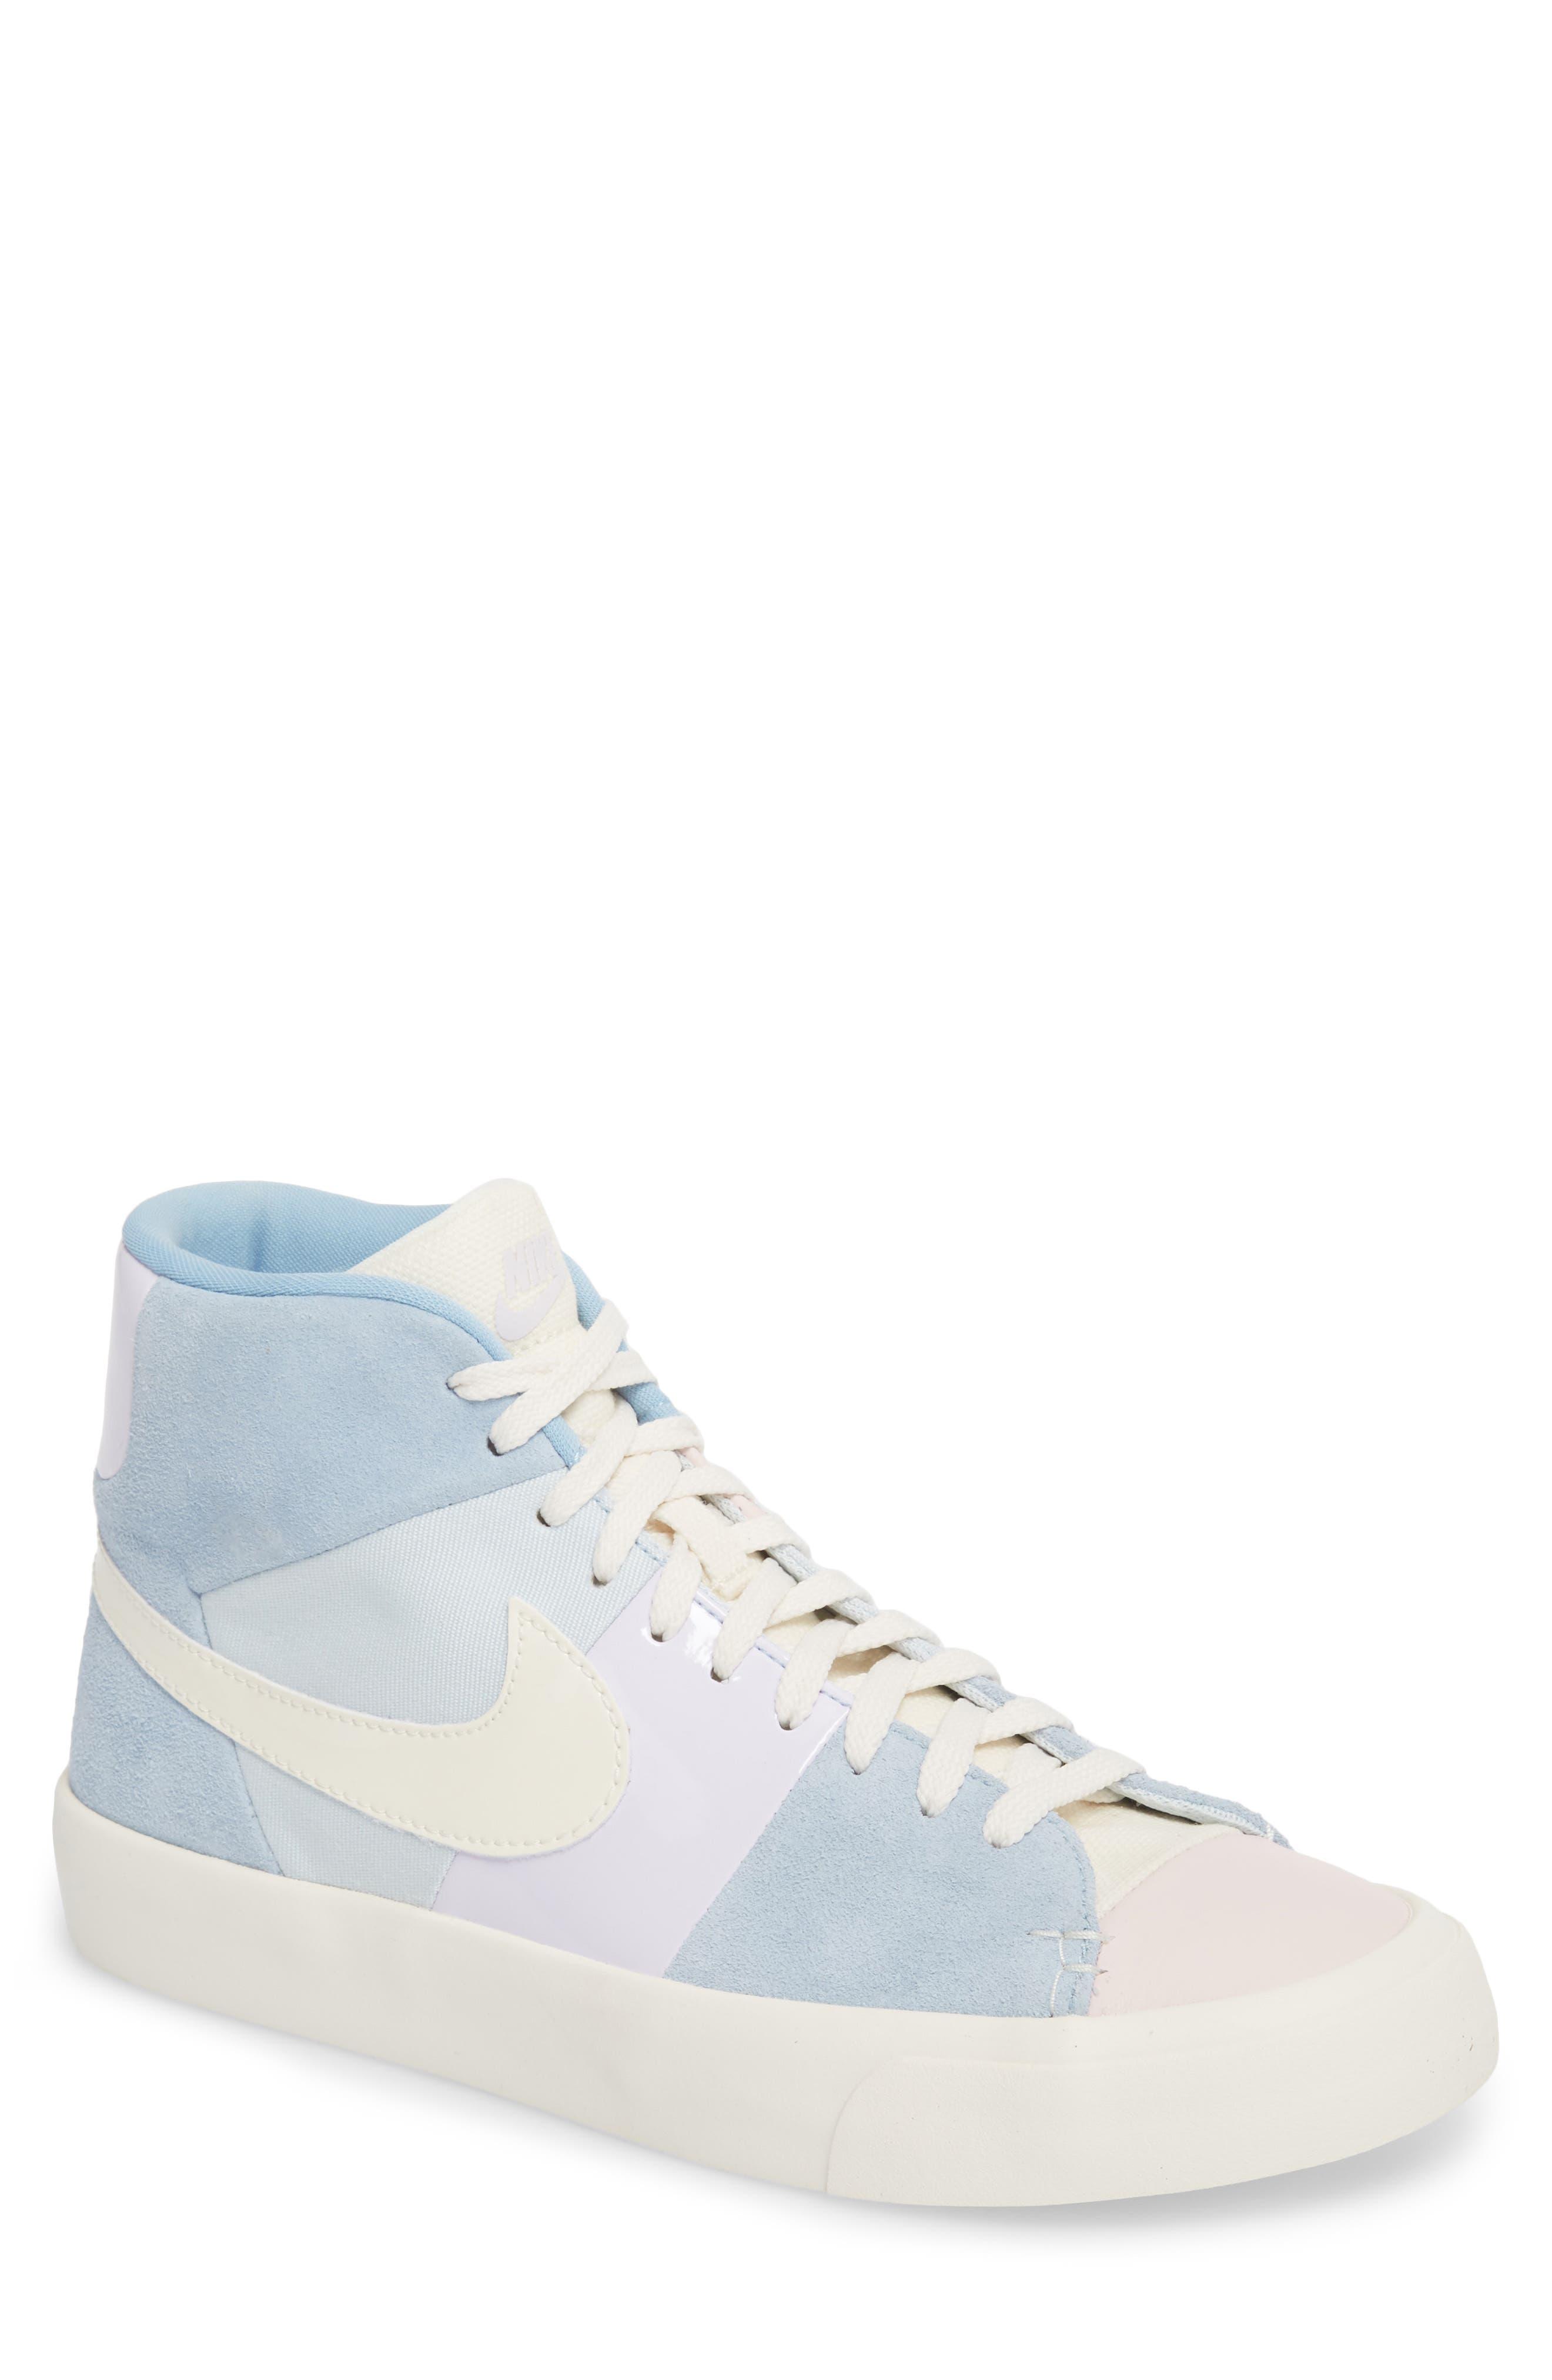 Blazer Royal Easter QS High Top Sneaker,                             Main thumbnail 1, color,                             650